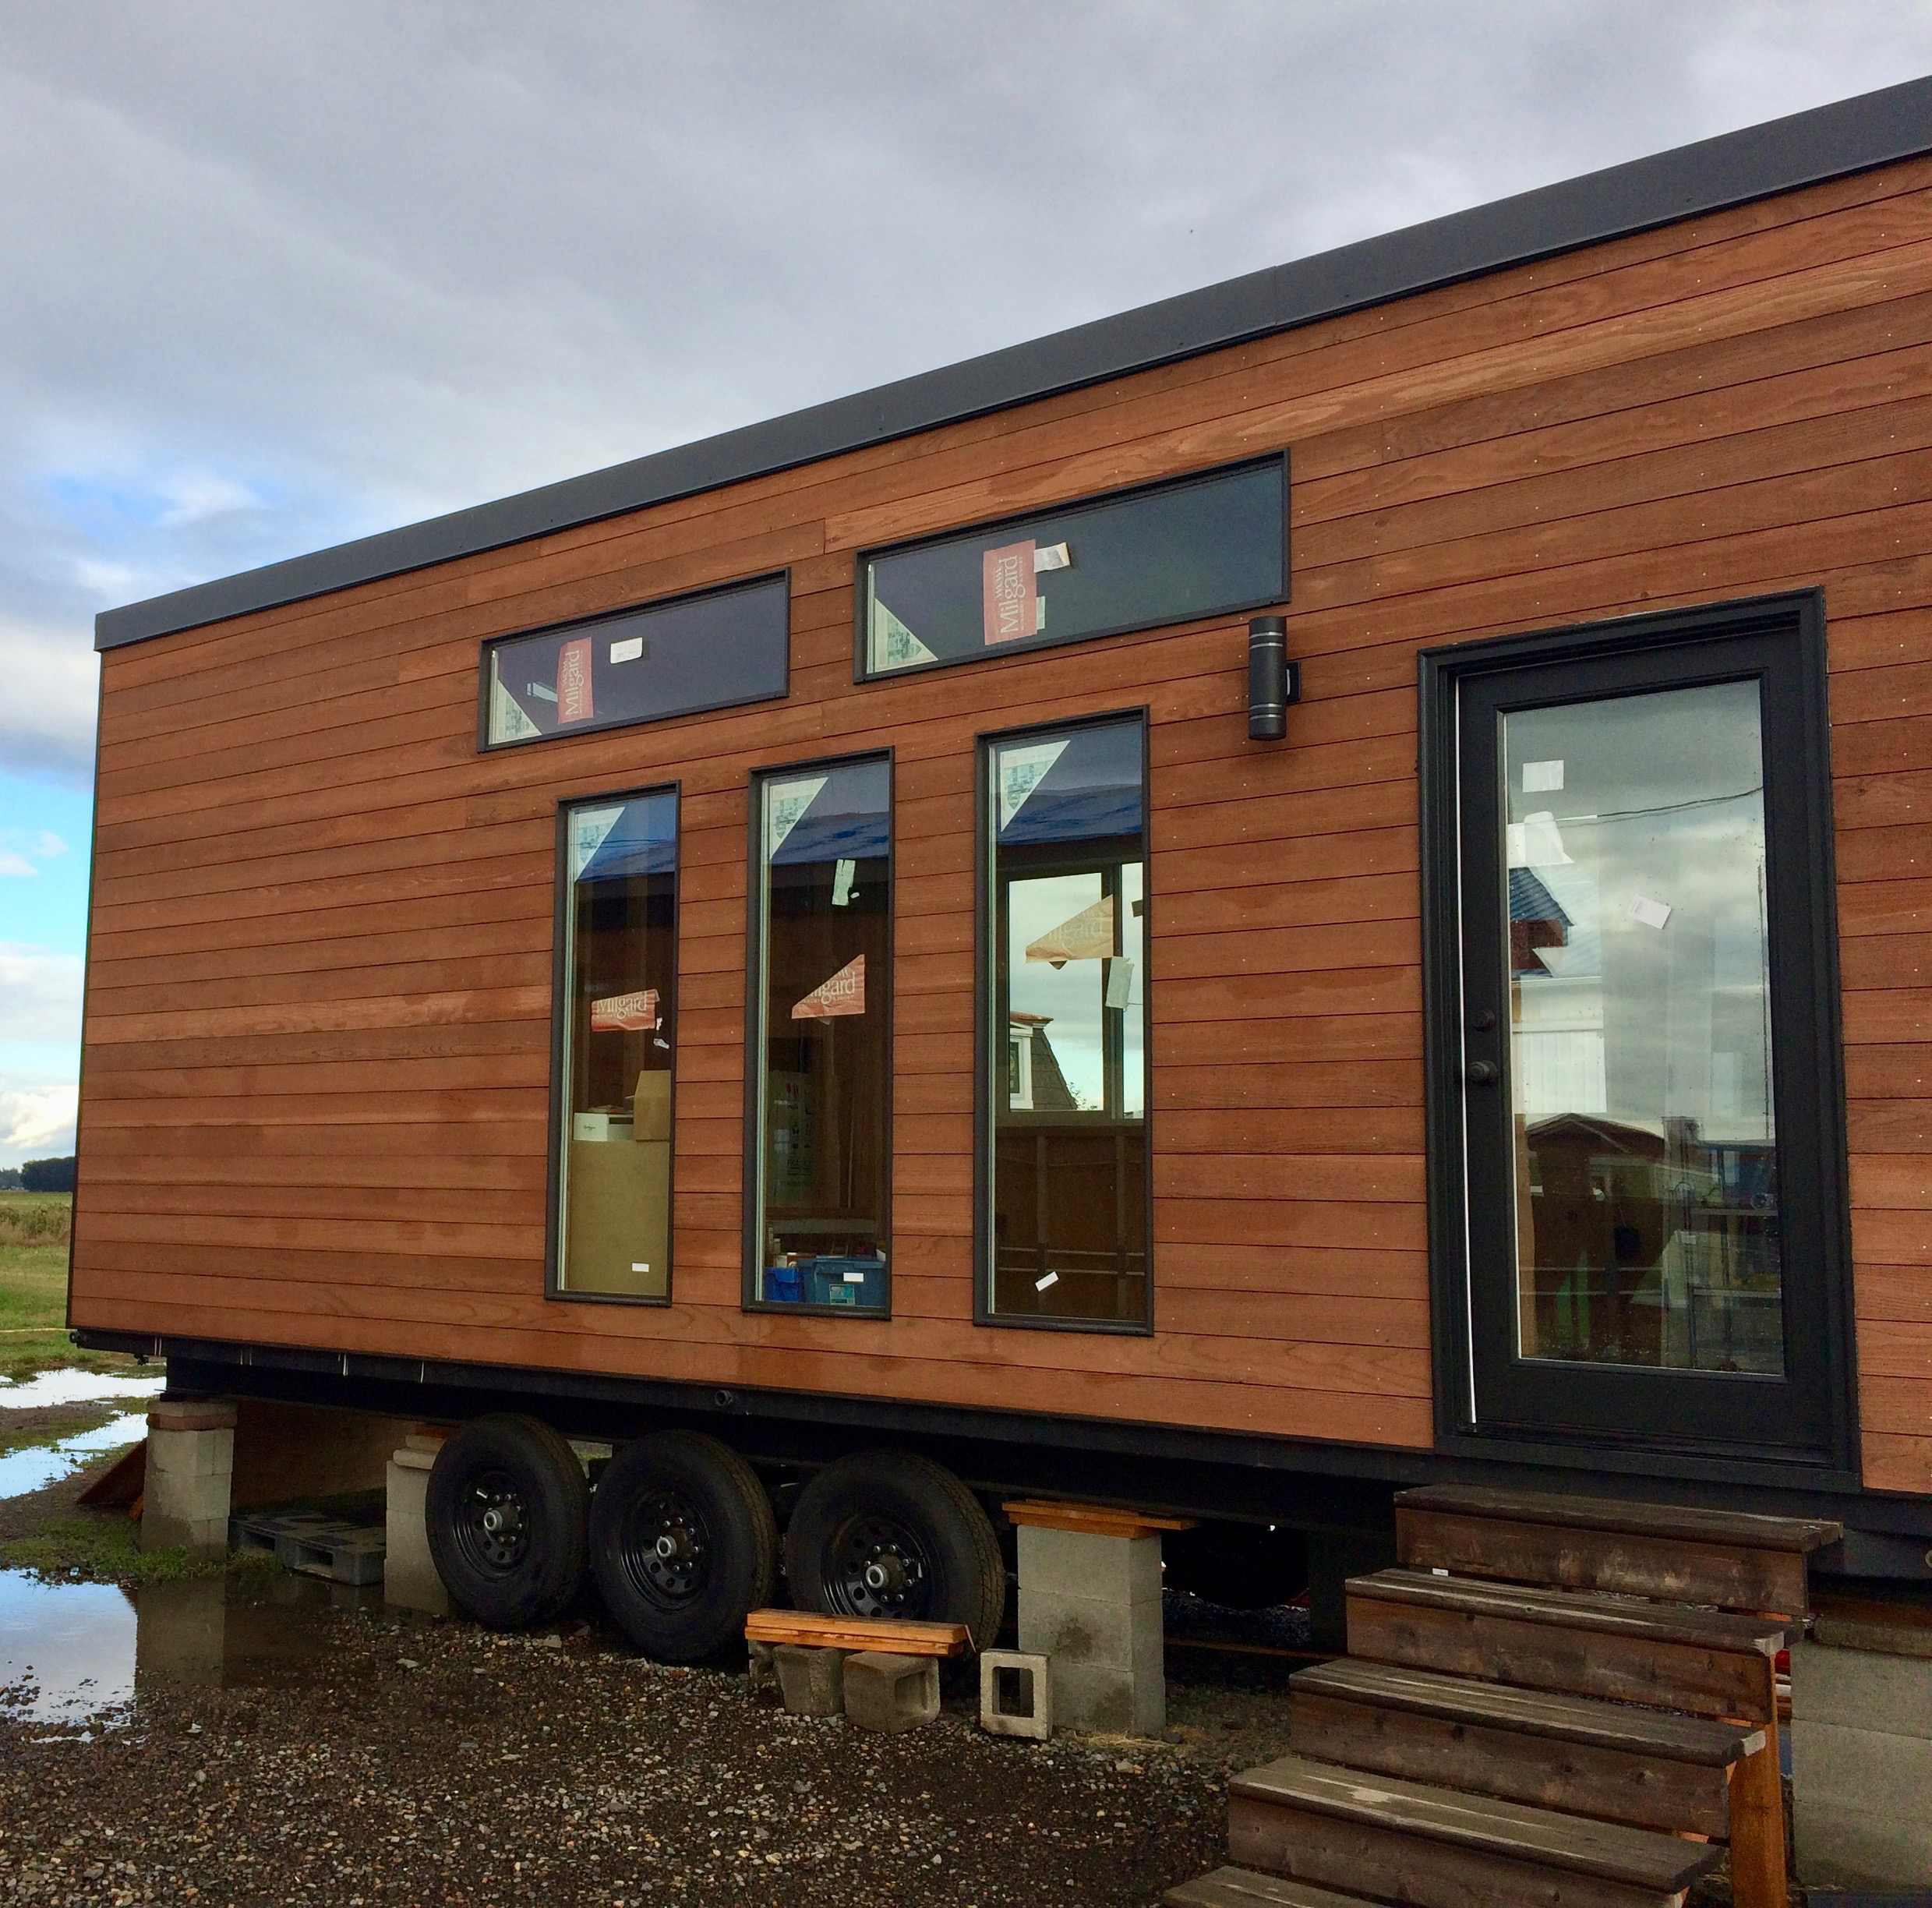 Willamette Farmhouse Tiny Smart House